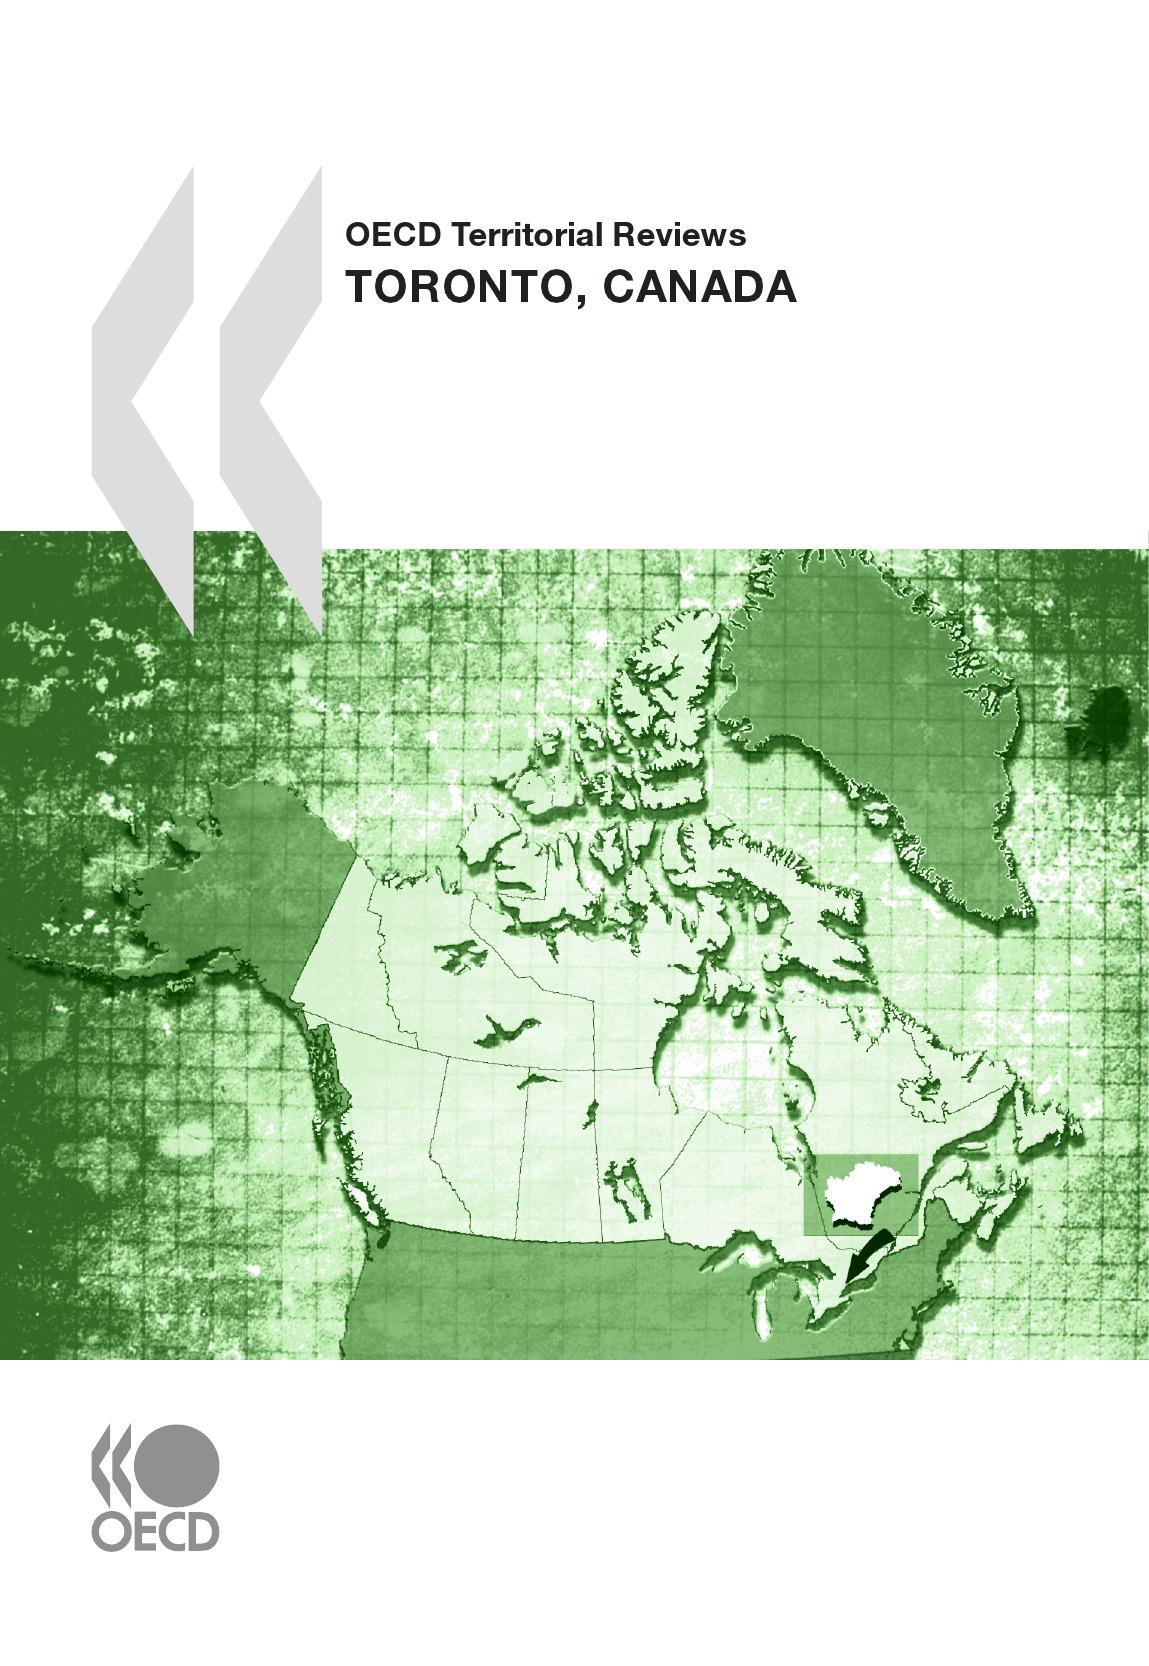 Oecd territorial reviews : toronto, canada 2009